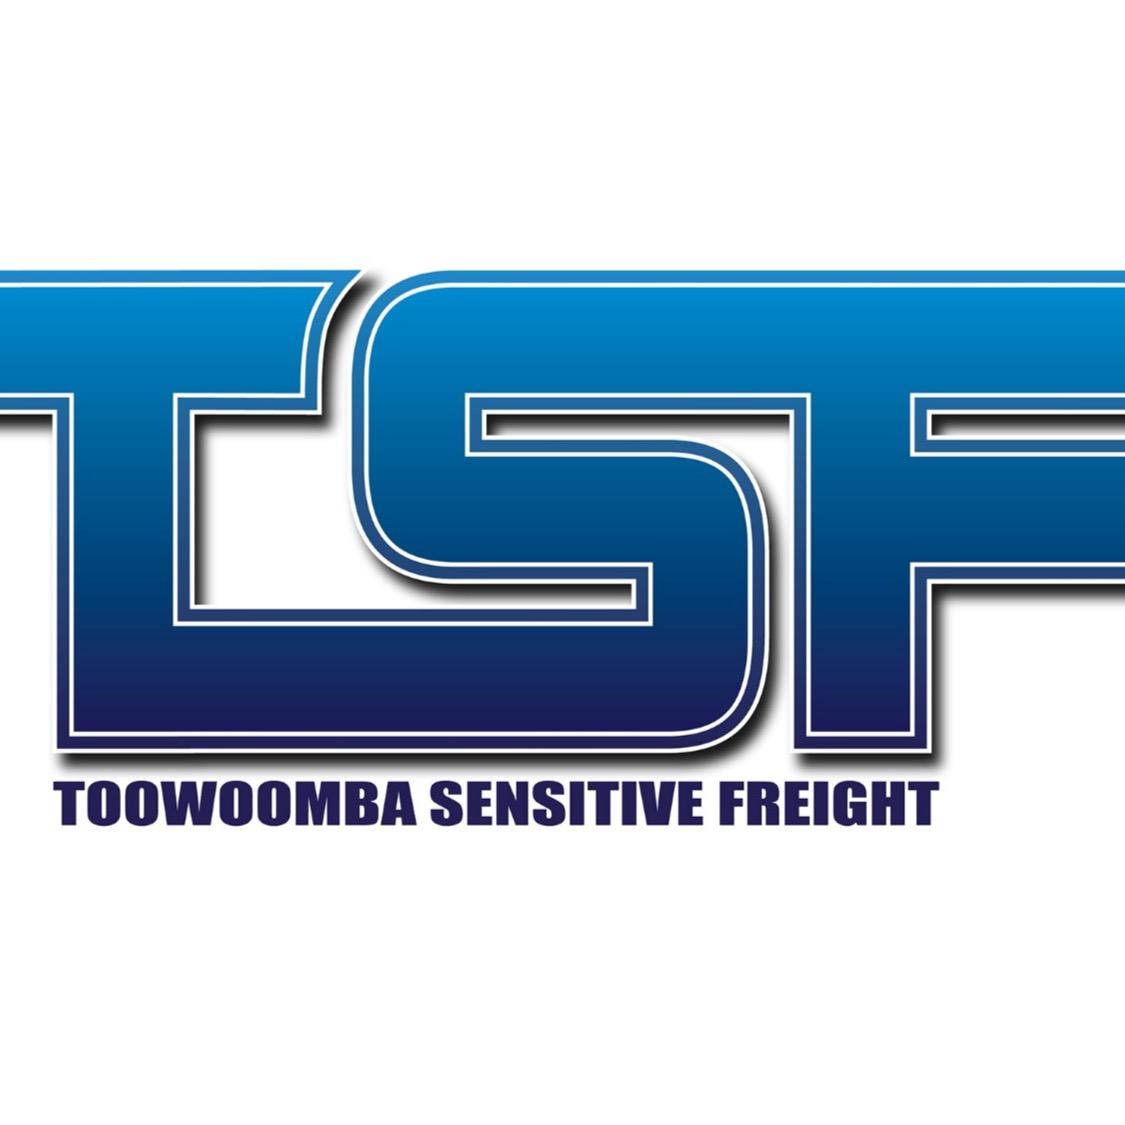 Toowoomba Sensitive Freight.